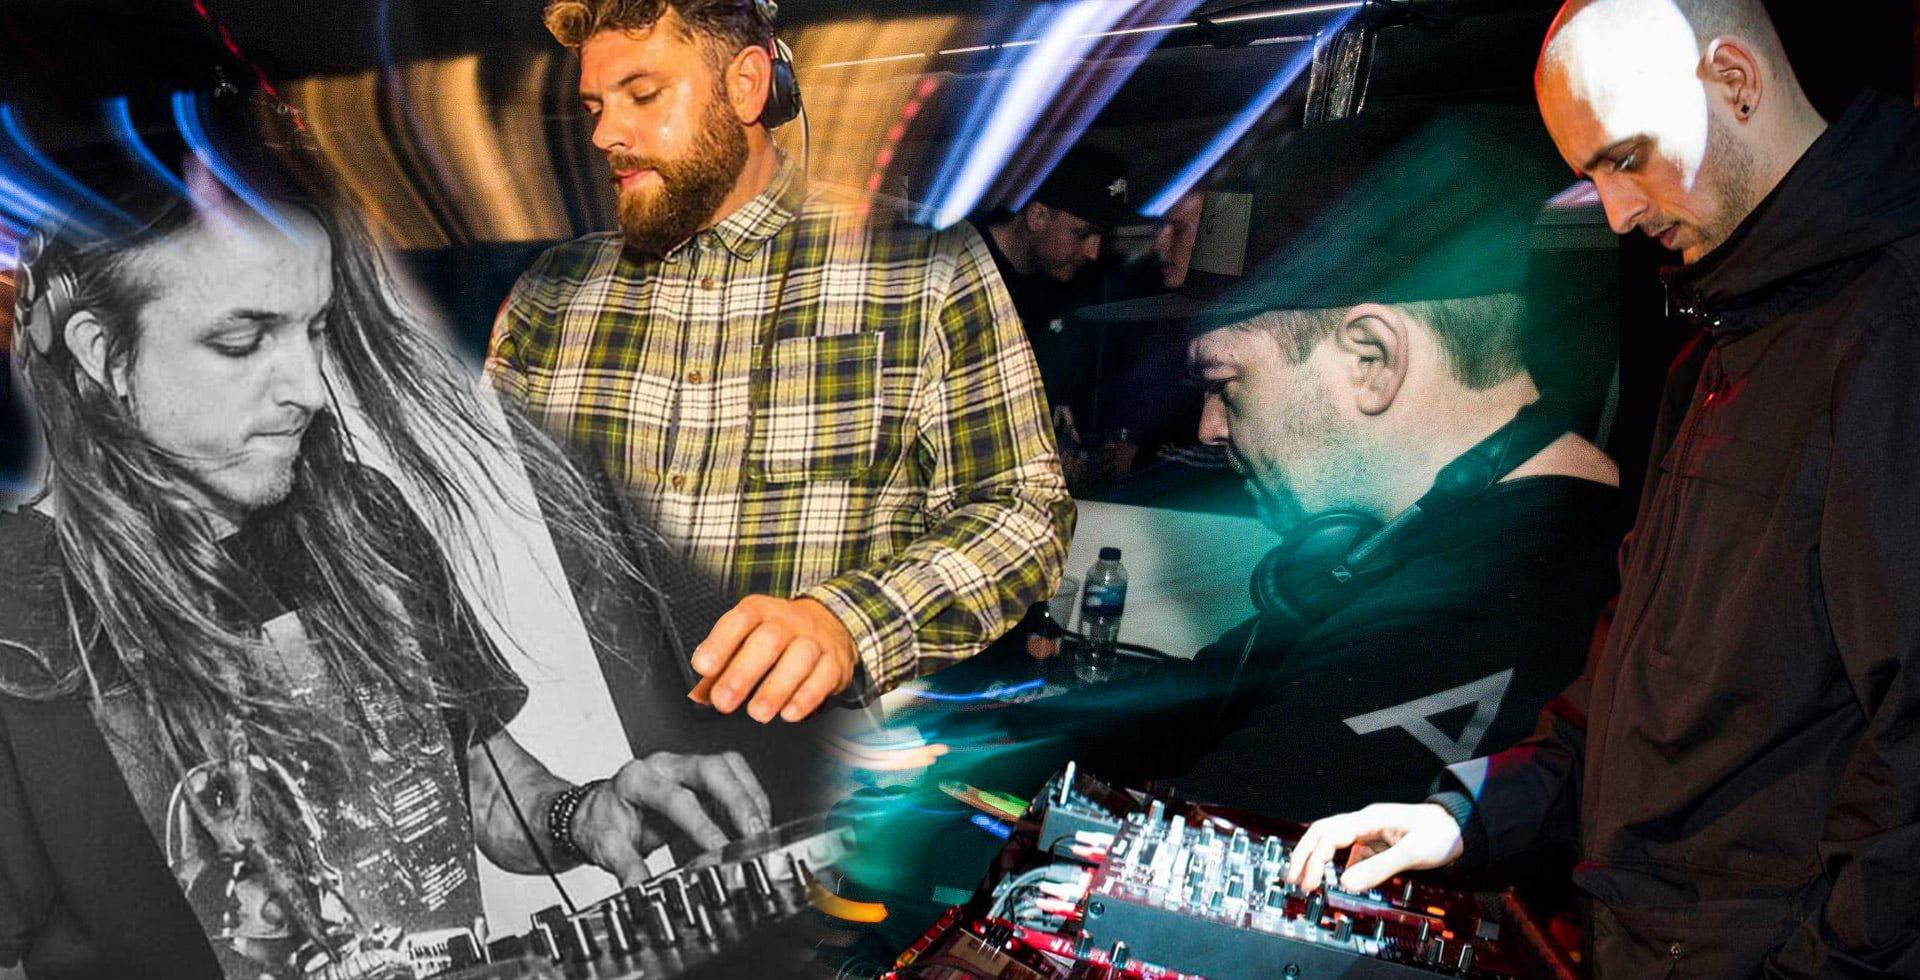 Wilkswood Roots Reggae 2019   Saturday Night Shhhbeen - Dubstep & DnB